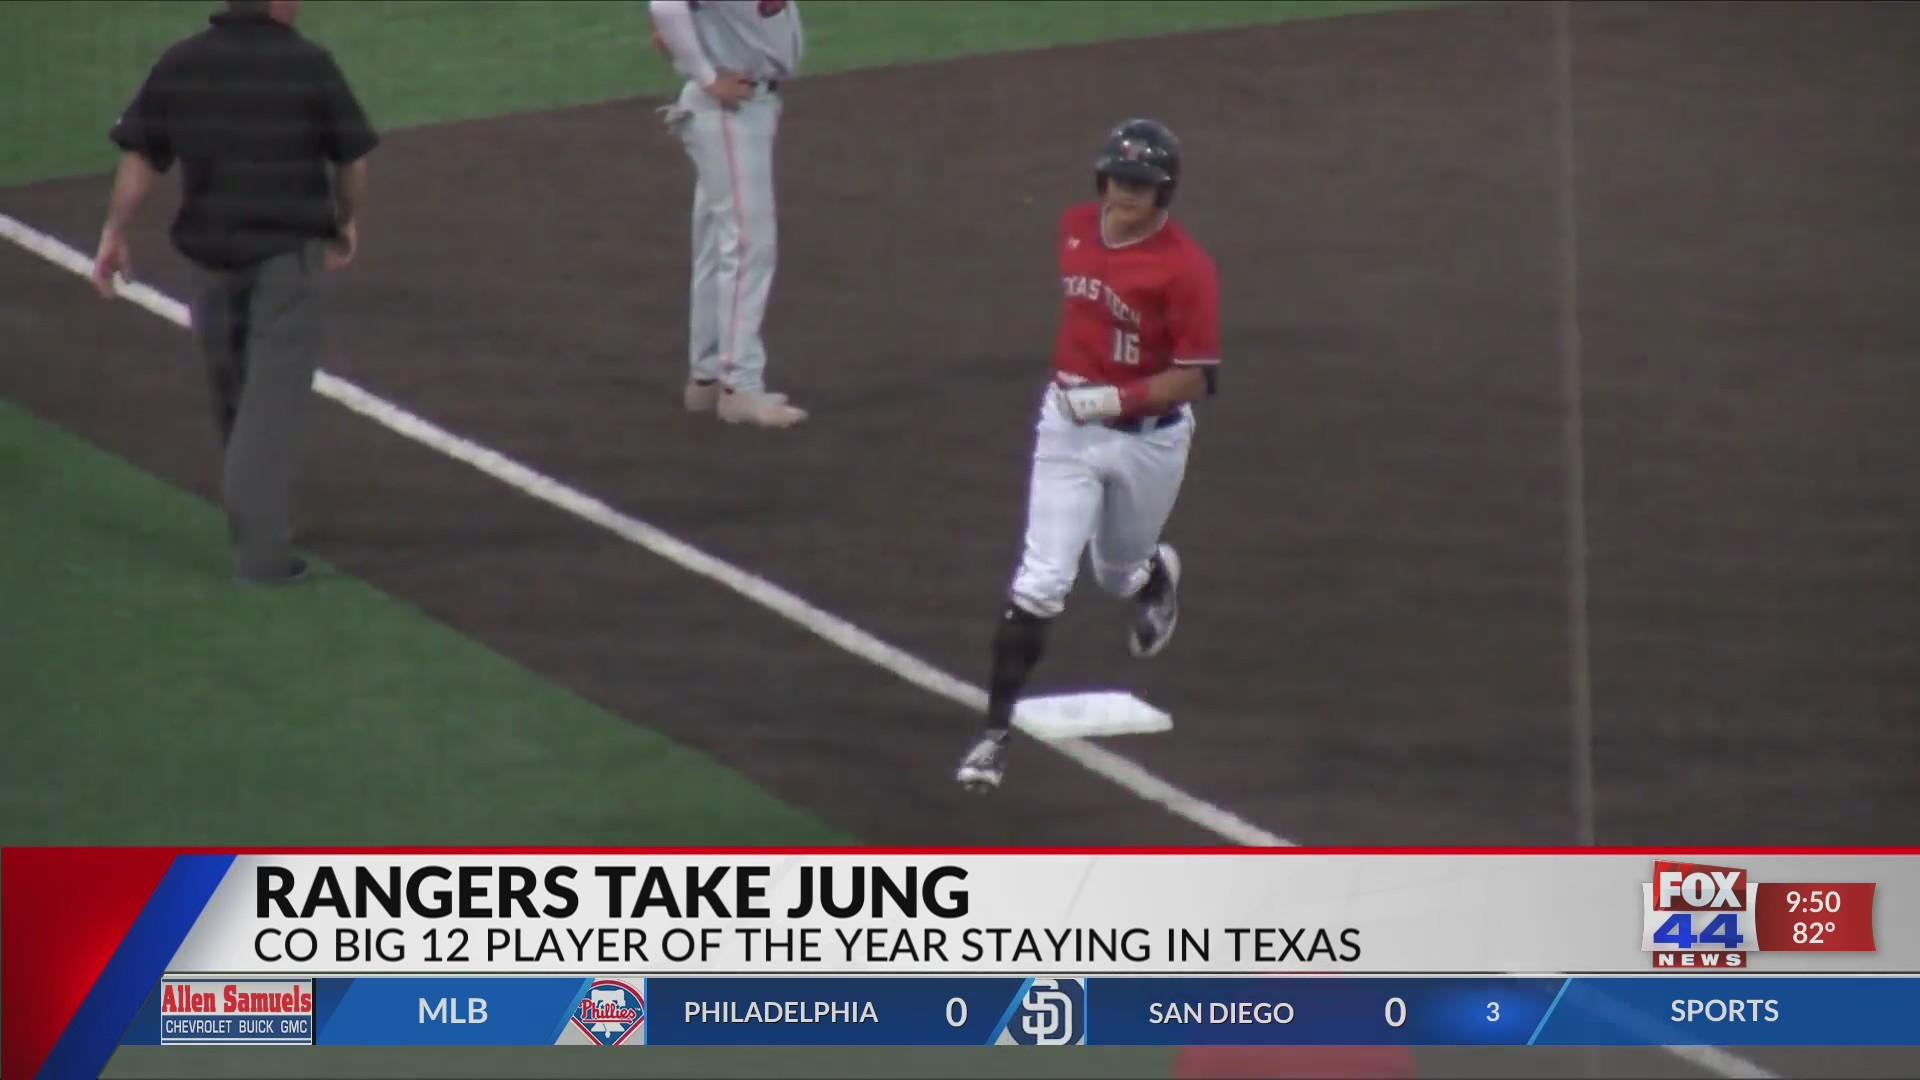 Rangers Talk Jung